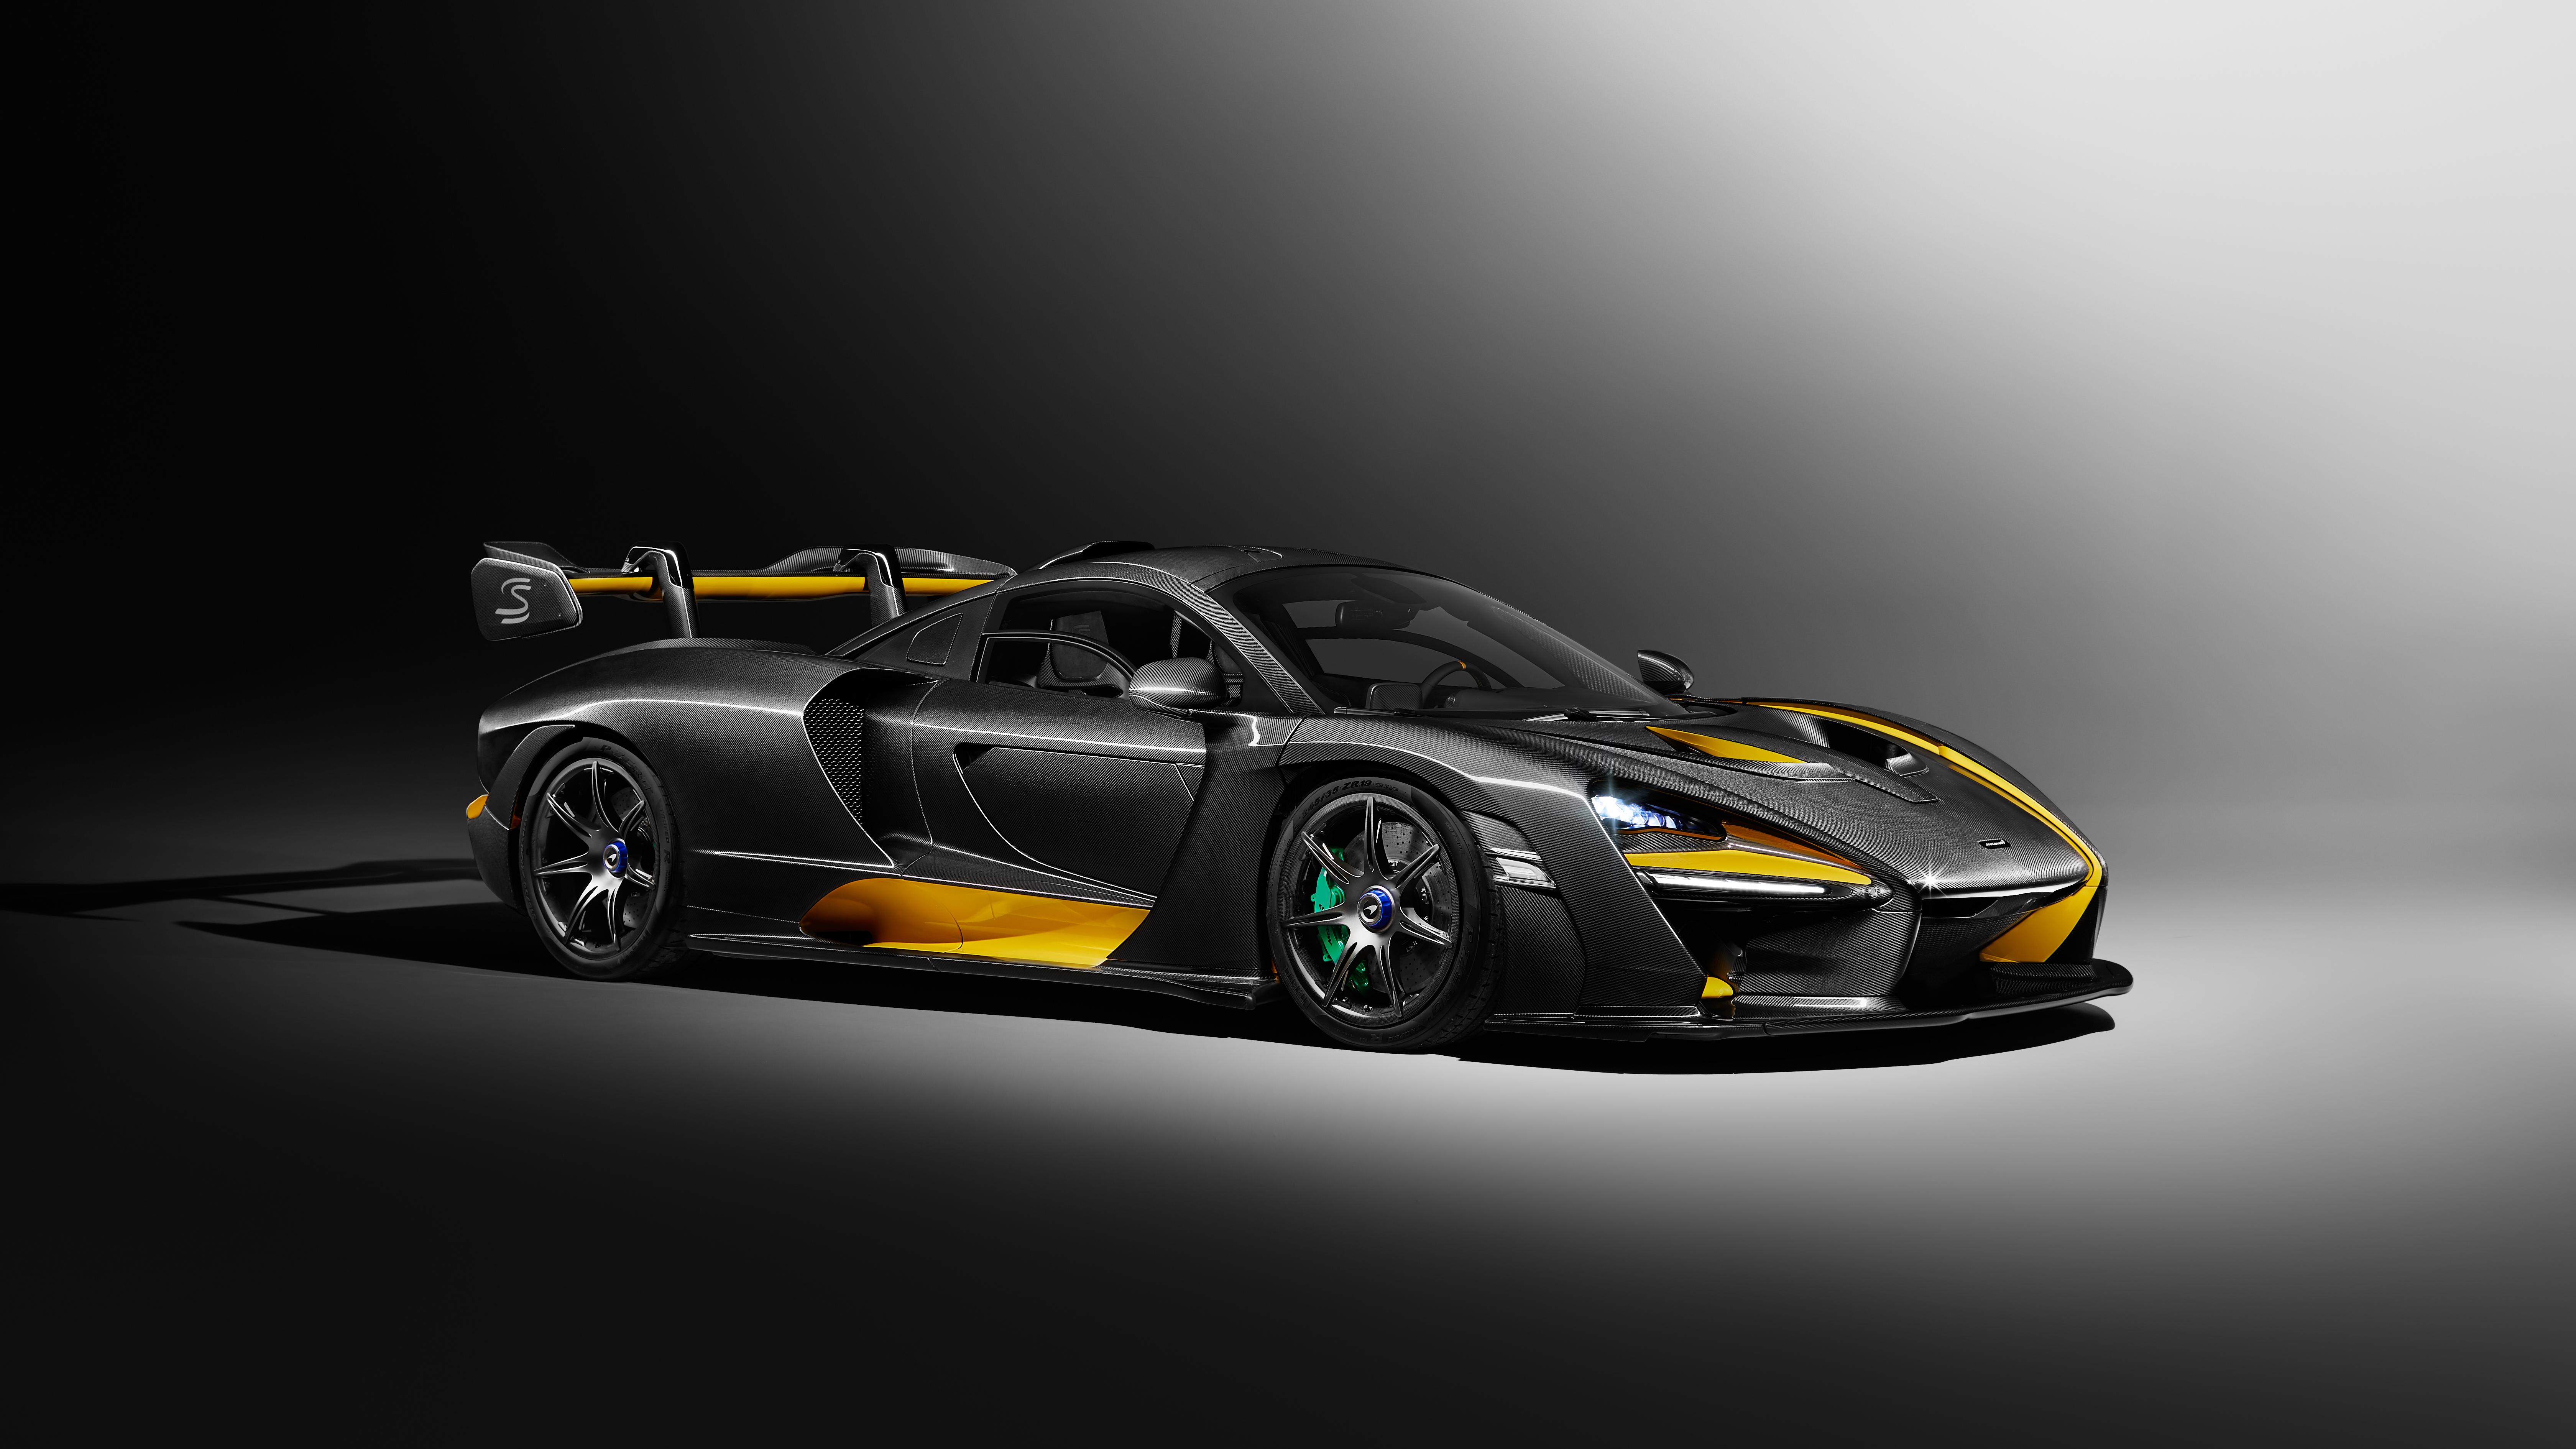 2019 Mclaren Senna Carbon Theme By Mso 5k Wallpaper Hd Car